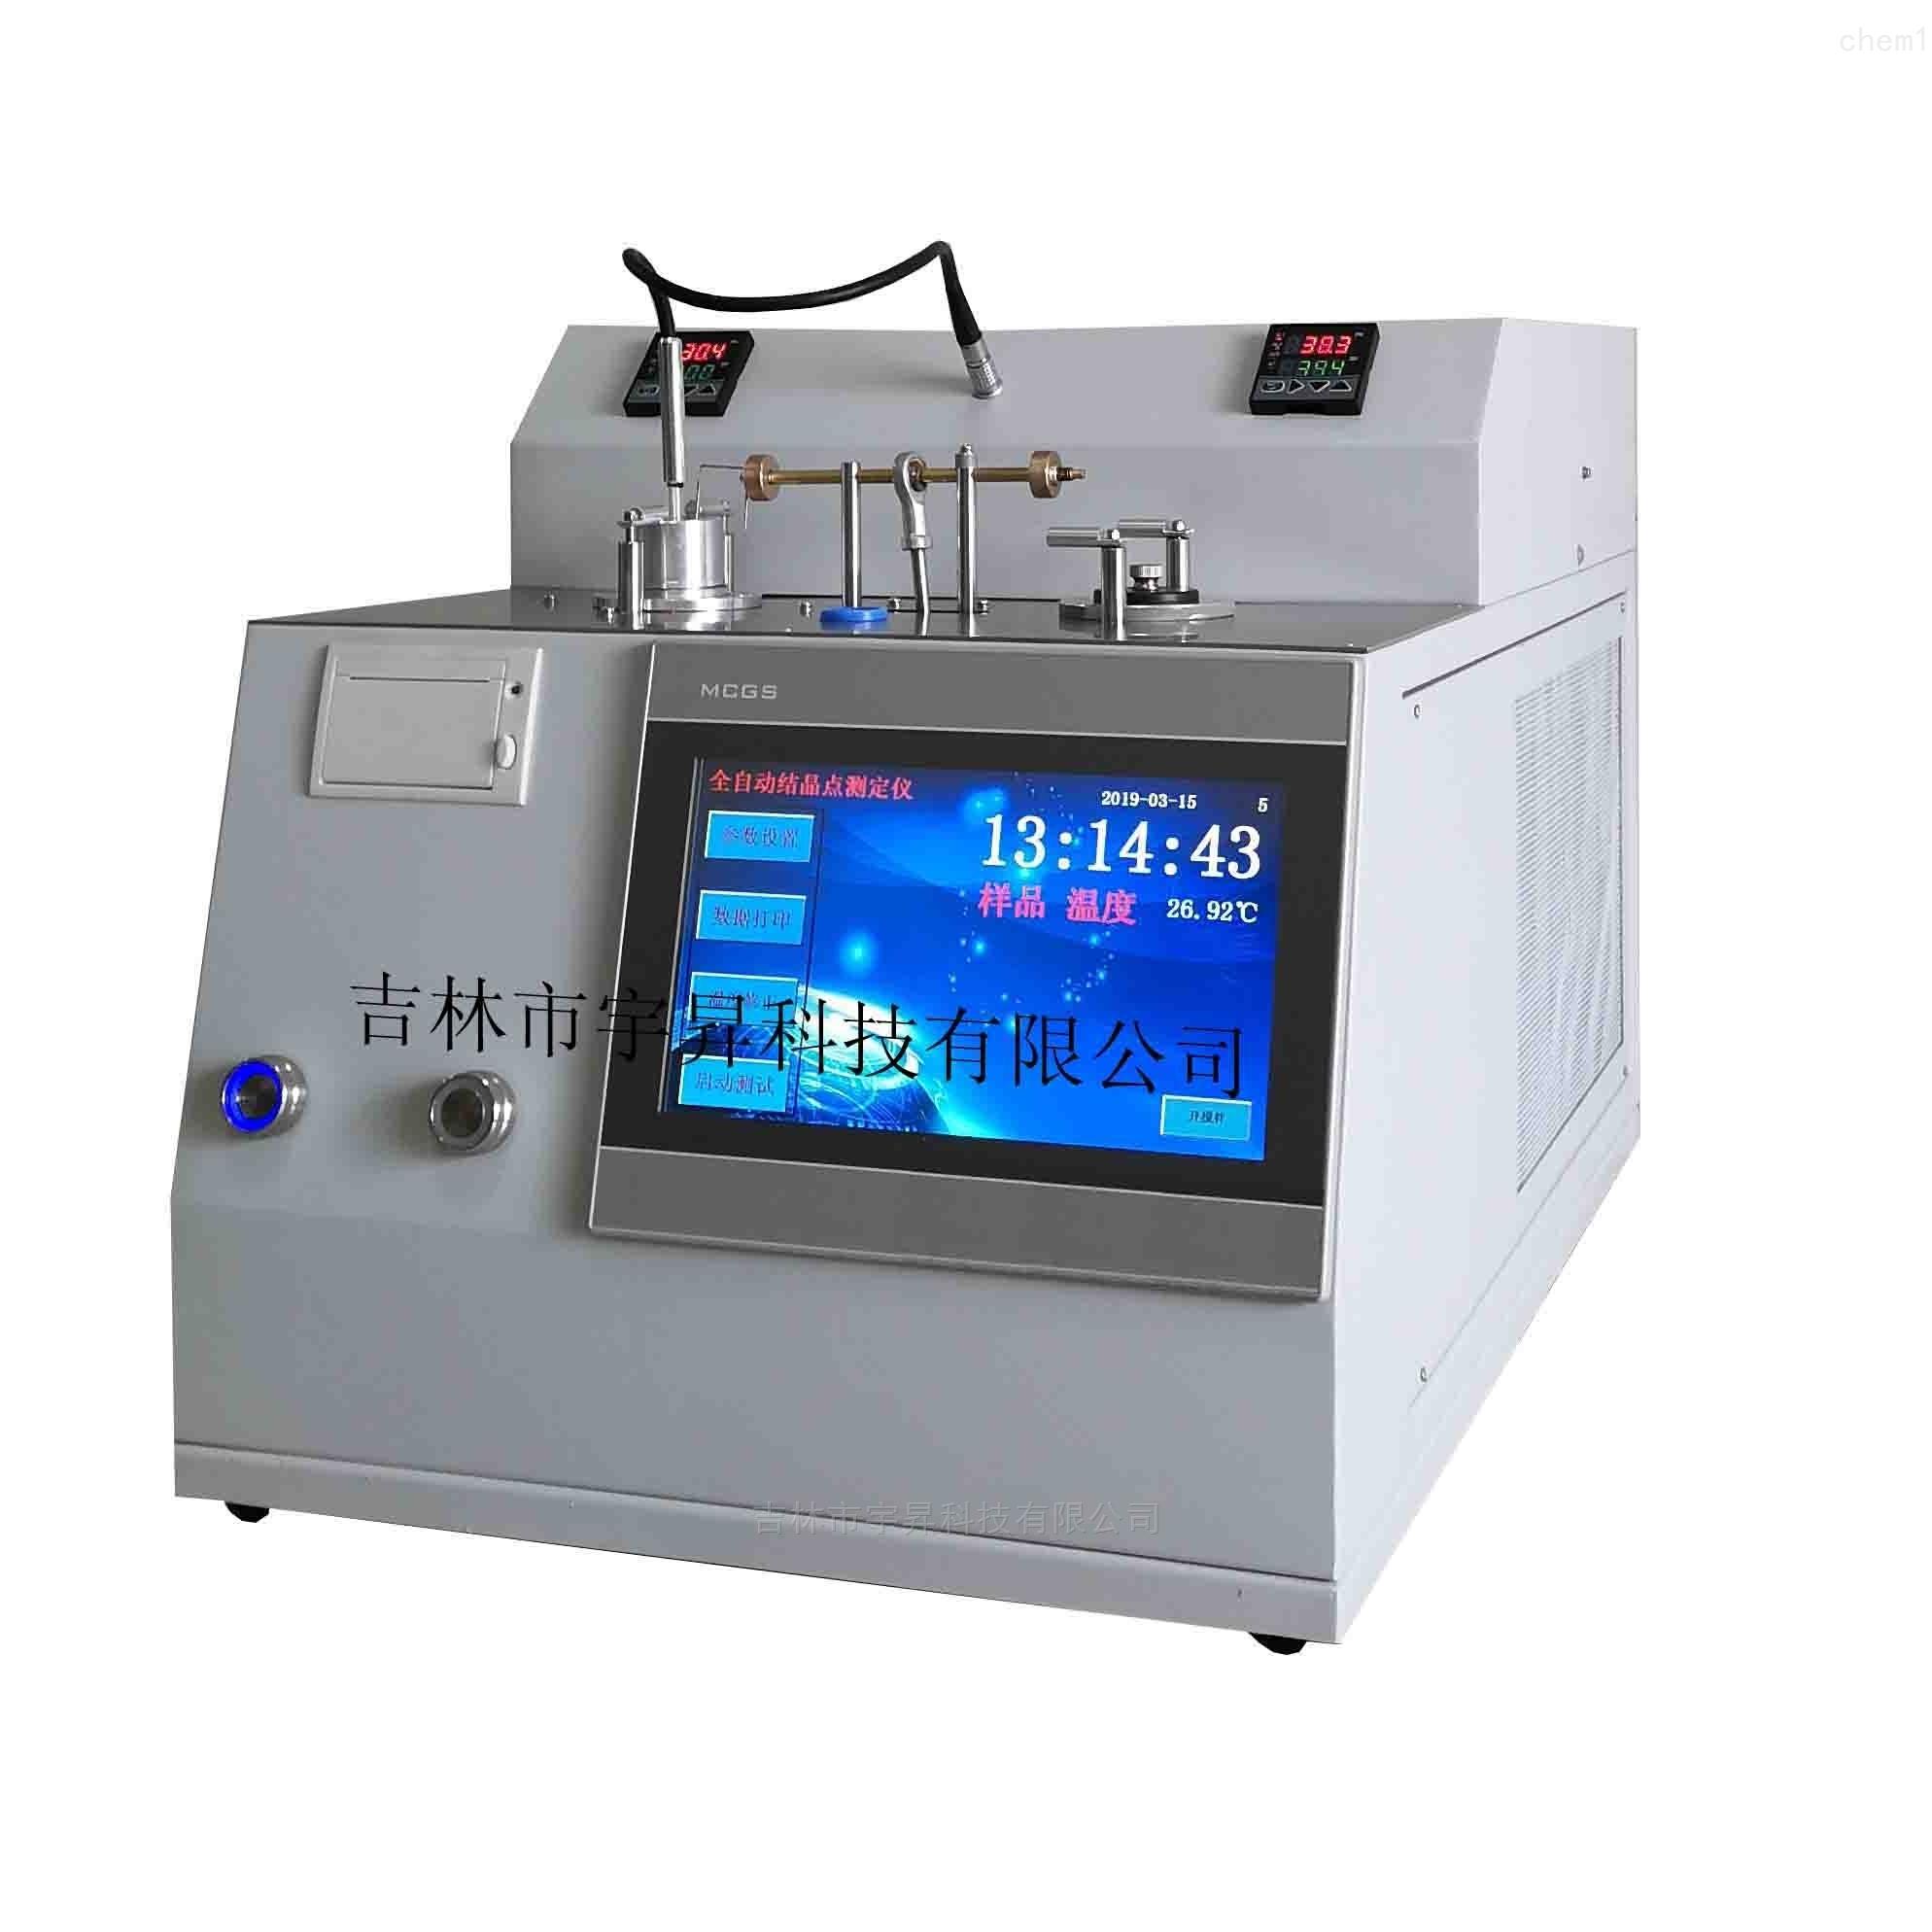 YSJJ-3069全自動萘結晶點測定儀